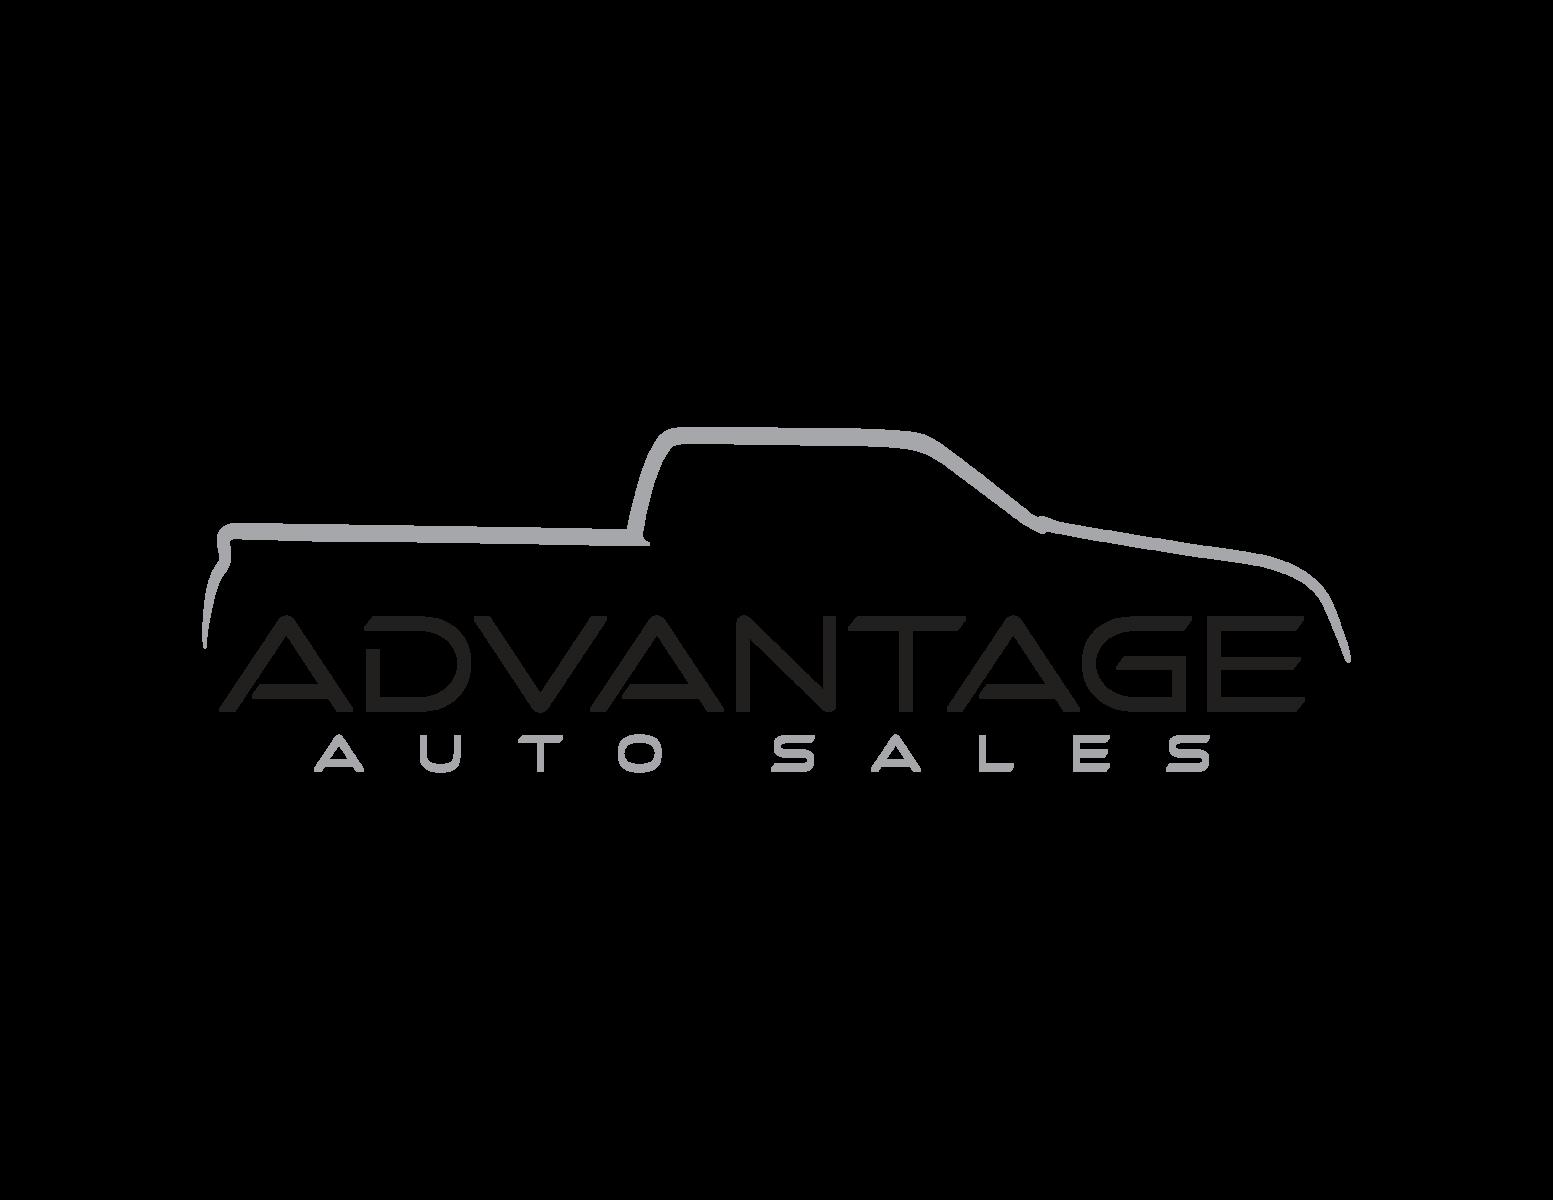 Advantage Auto Sales   Top New Car Release Date